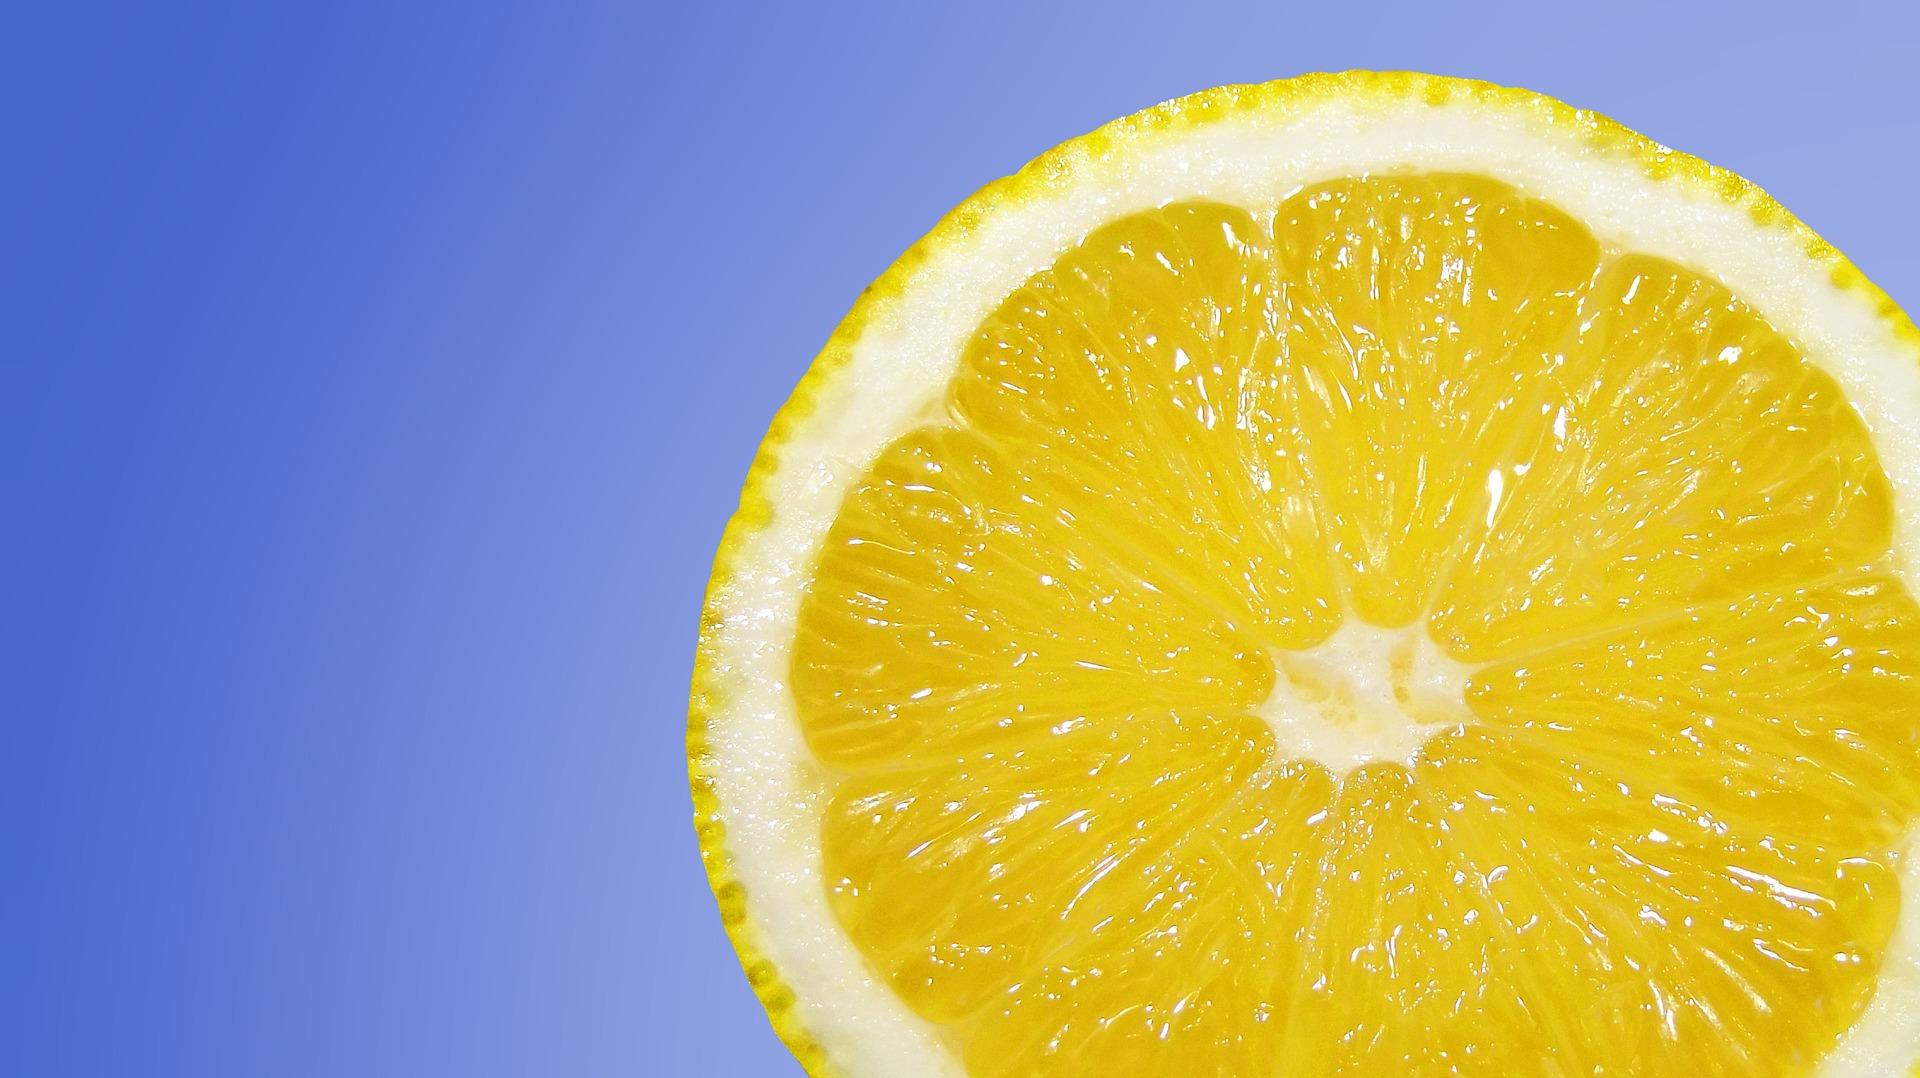 lemon-1024641_1920.jpg